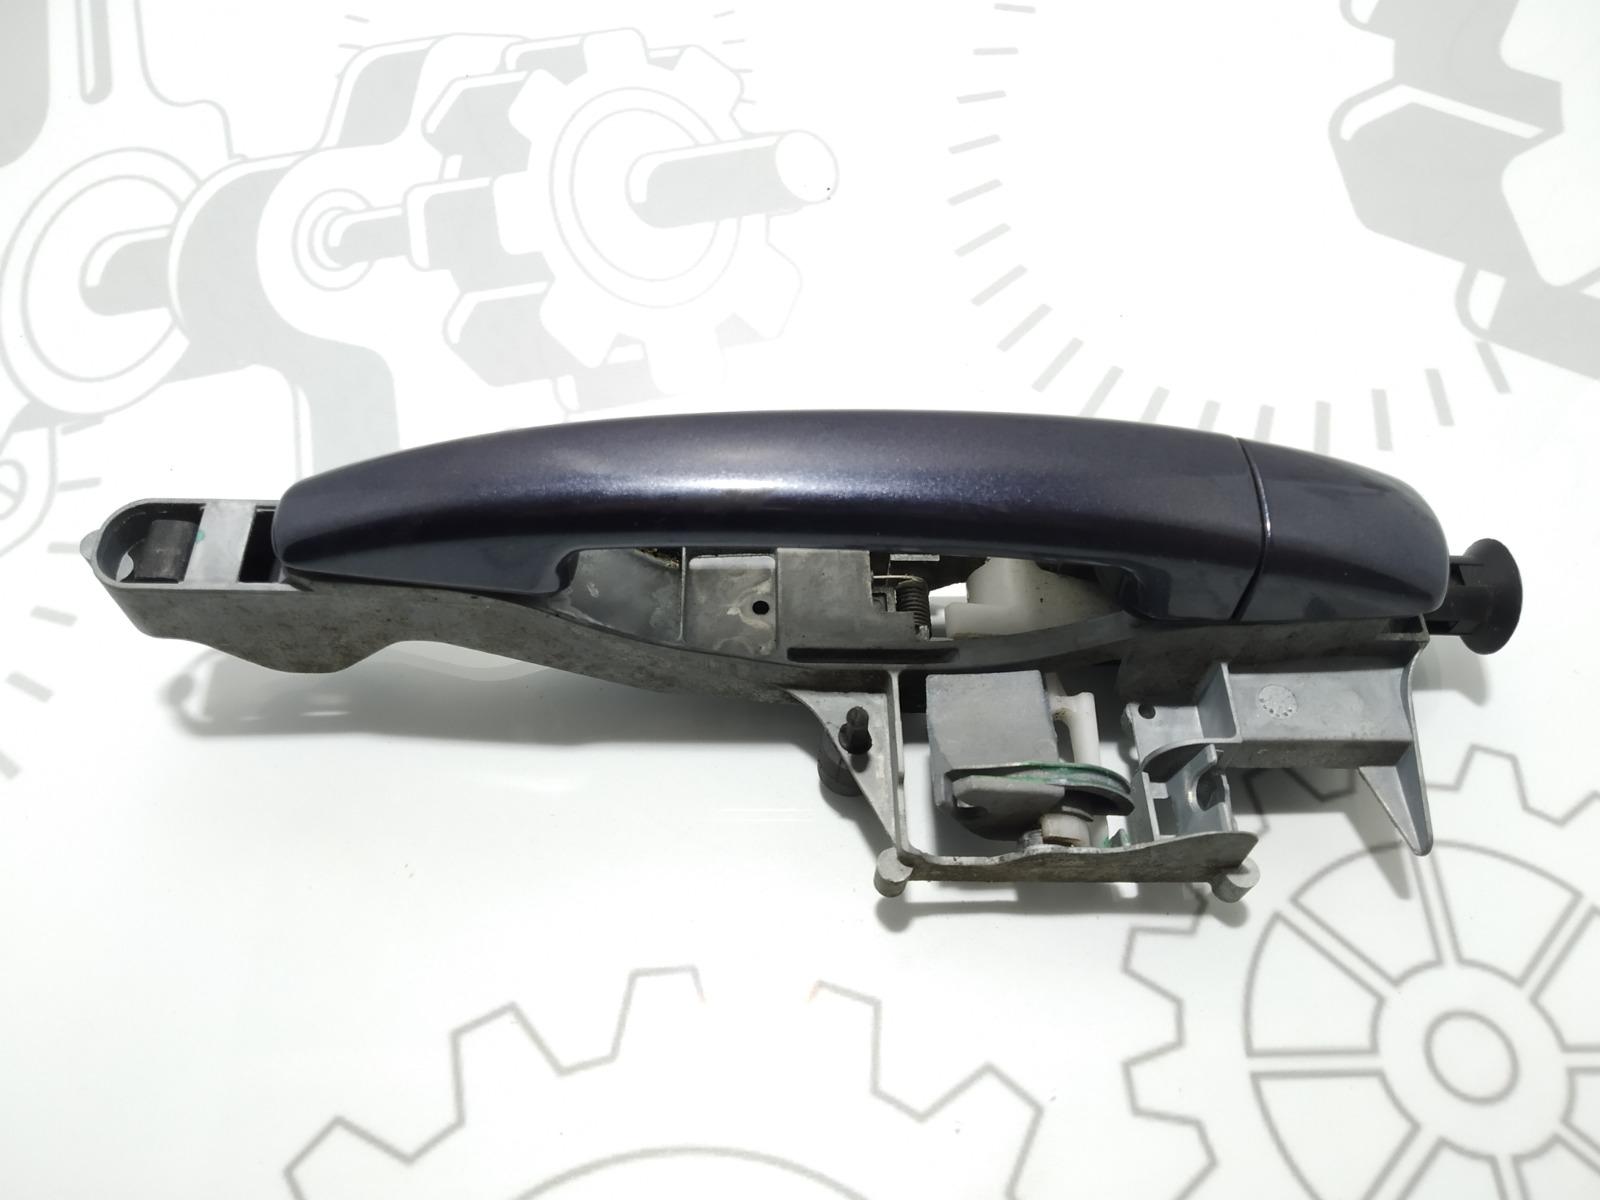 Ручка наружная задняя правая Citroen C4 Picasso 2.0 HDI 2008 (б/у)